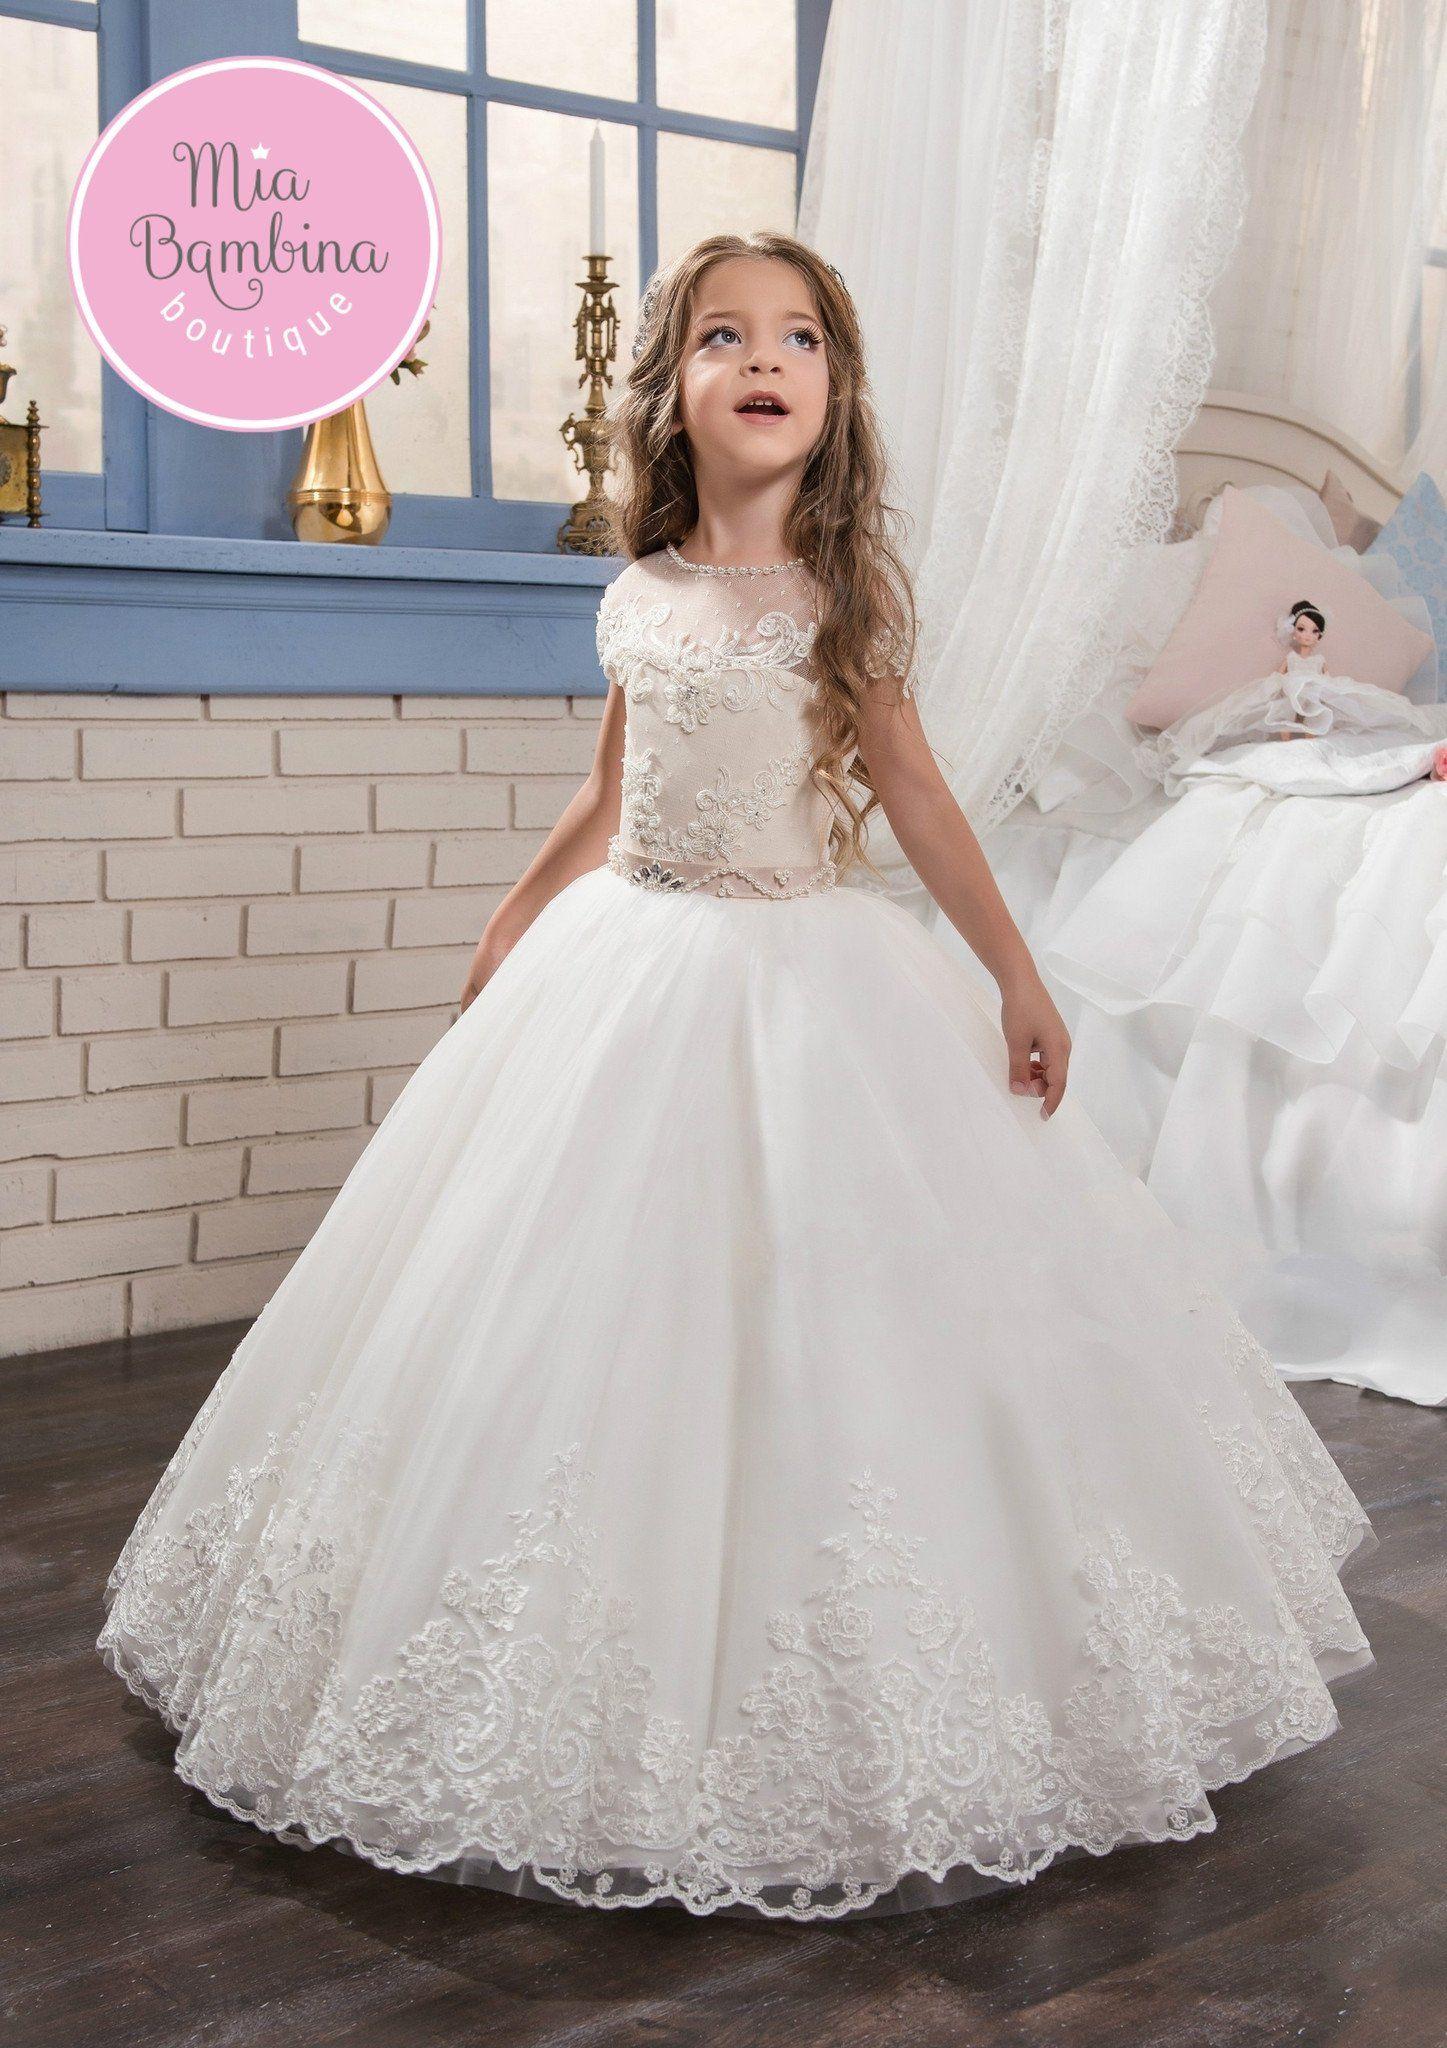 Modesto asas dos sonhos pinterest girls dresses dresses and optional title display izmirmasajfo